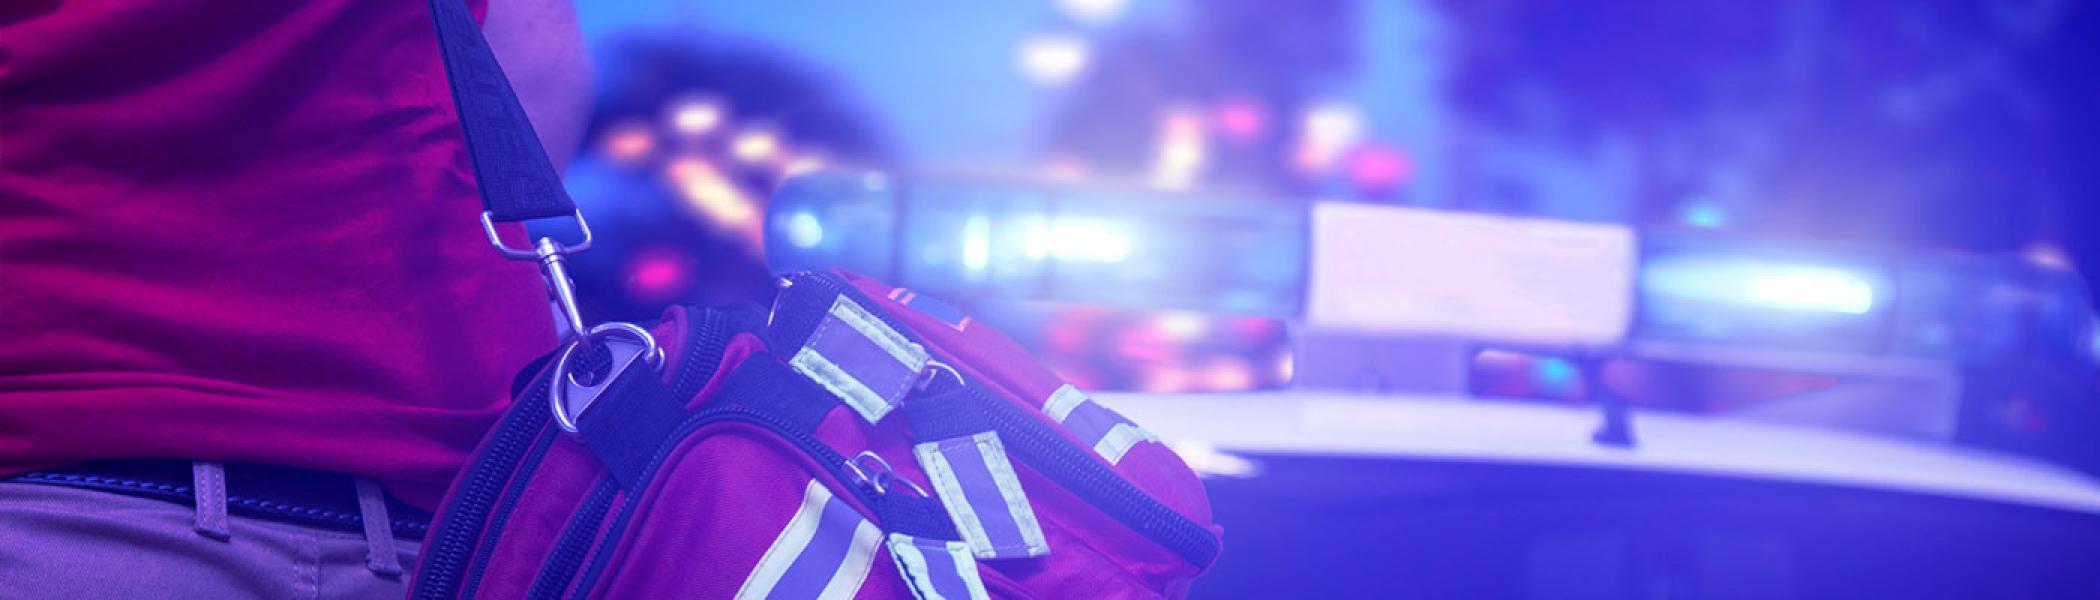 paramedic walking towards emergency vehicle